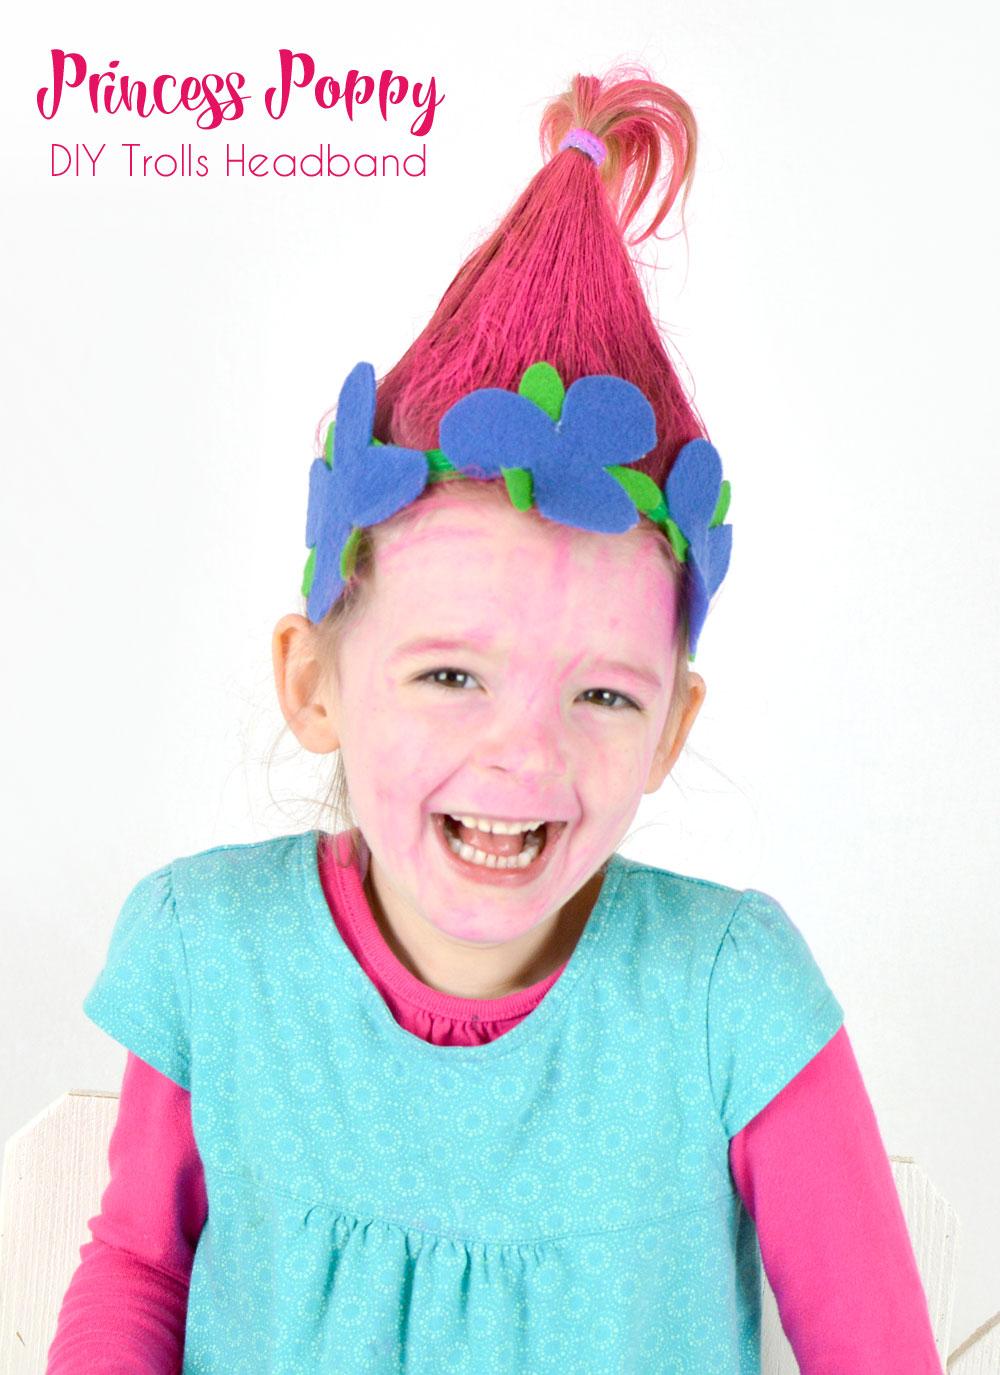 DIY Princess Poppy flower headband craft for girls